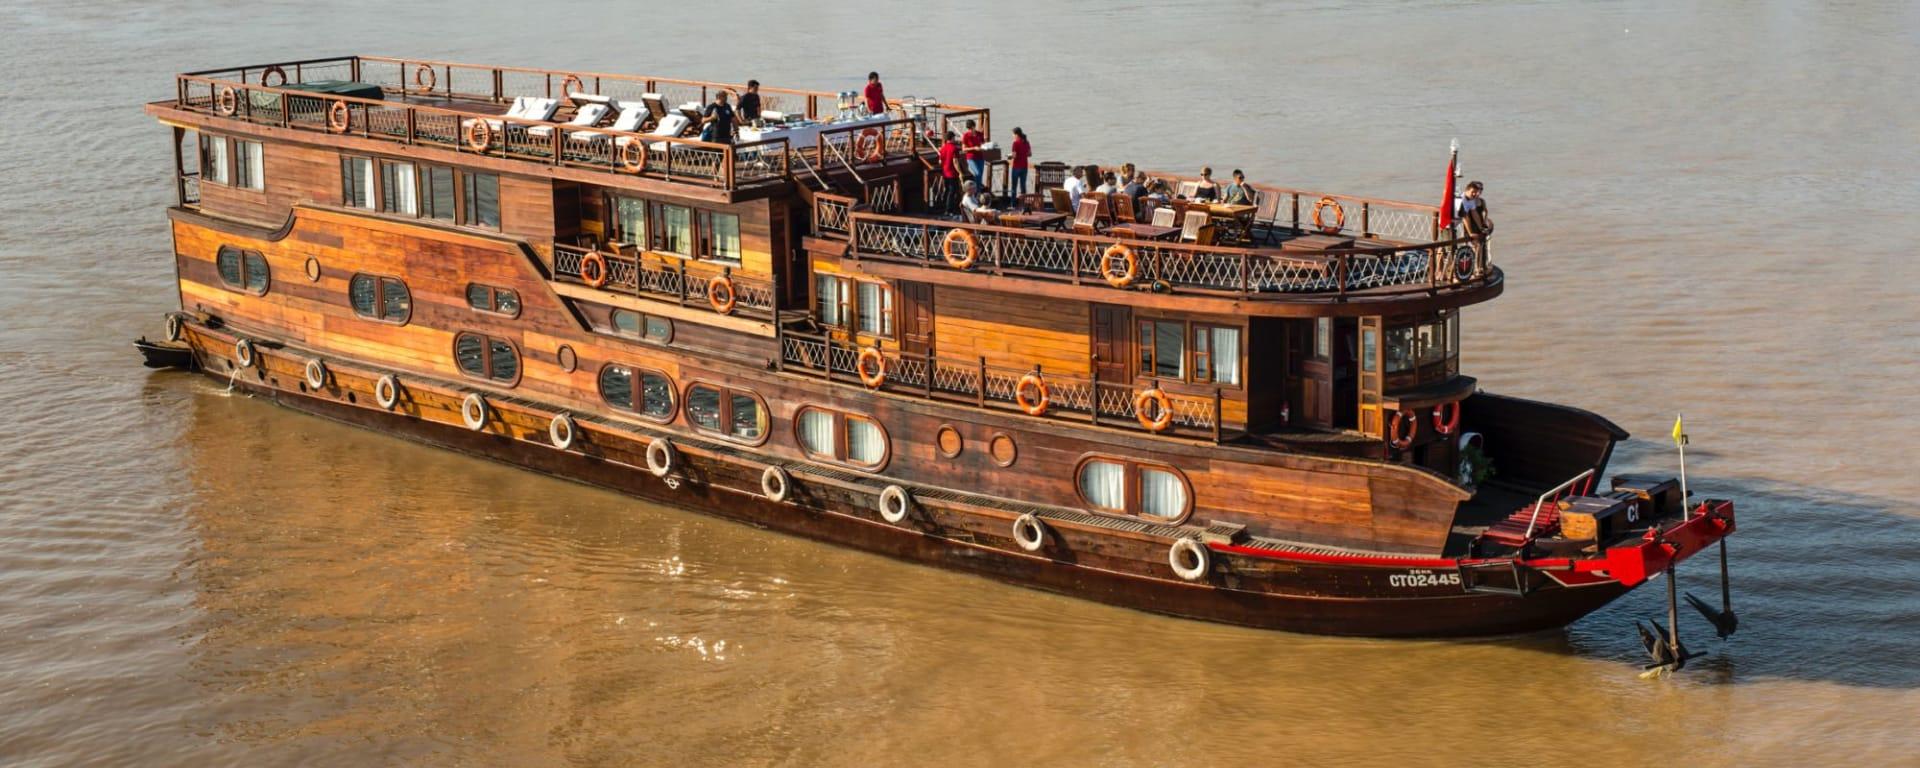 Mekong Delta Fluss-Kreuzfahrten mit «Mekong Eyes» ab Saigon: ME overview 3